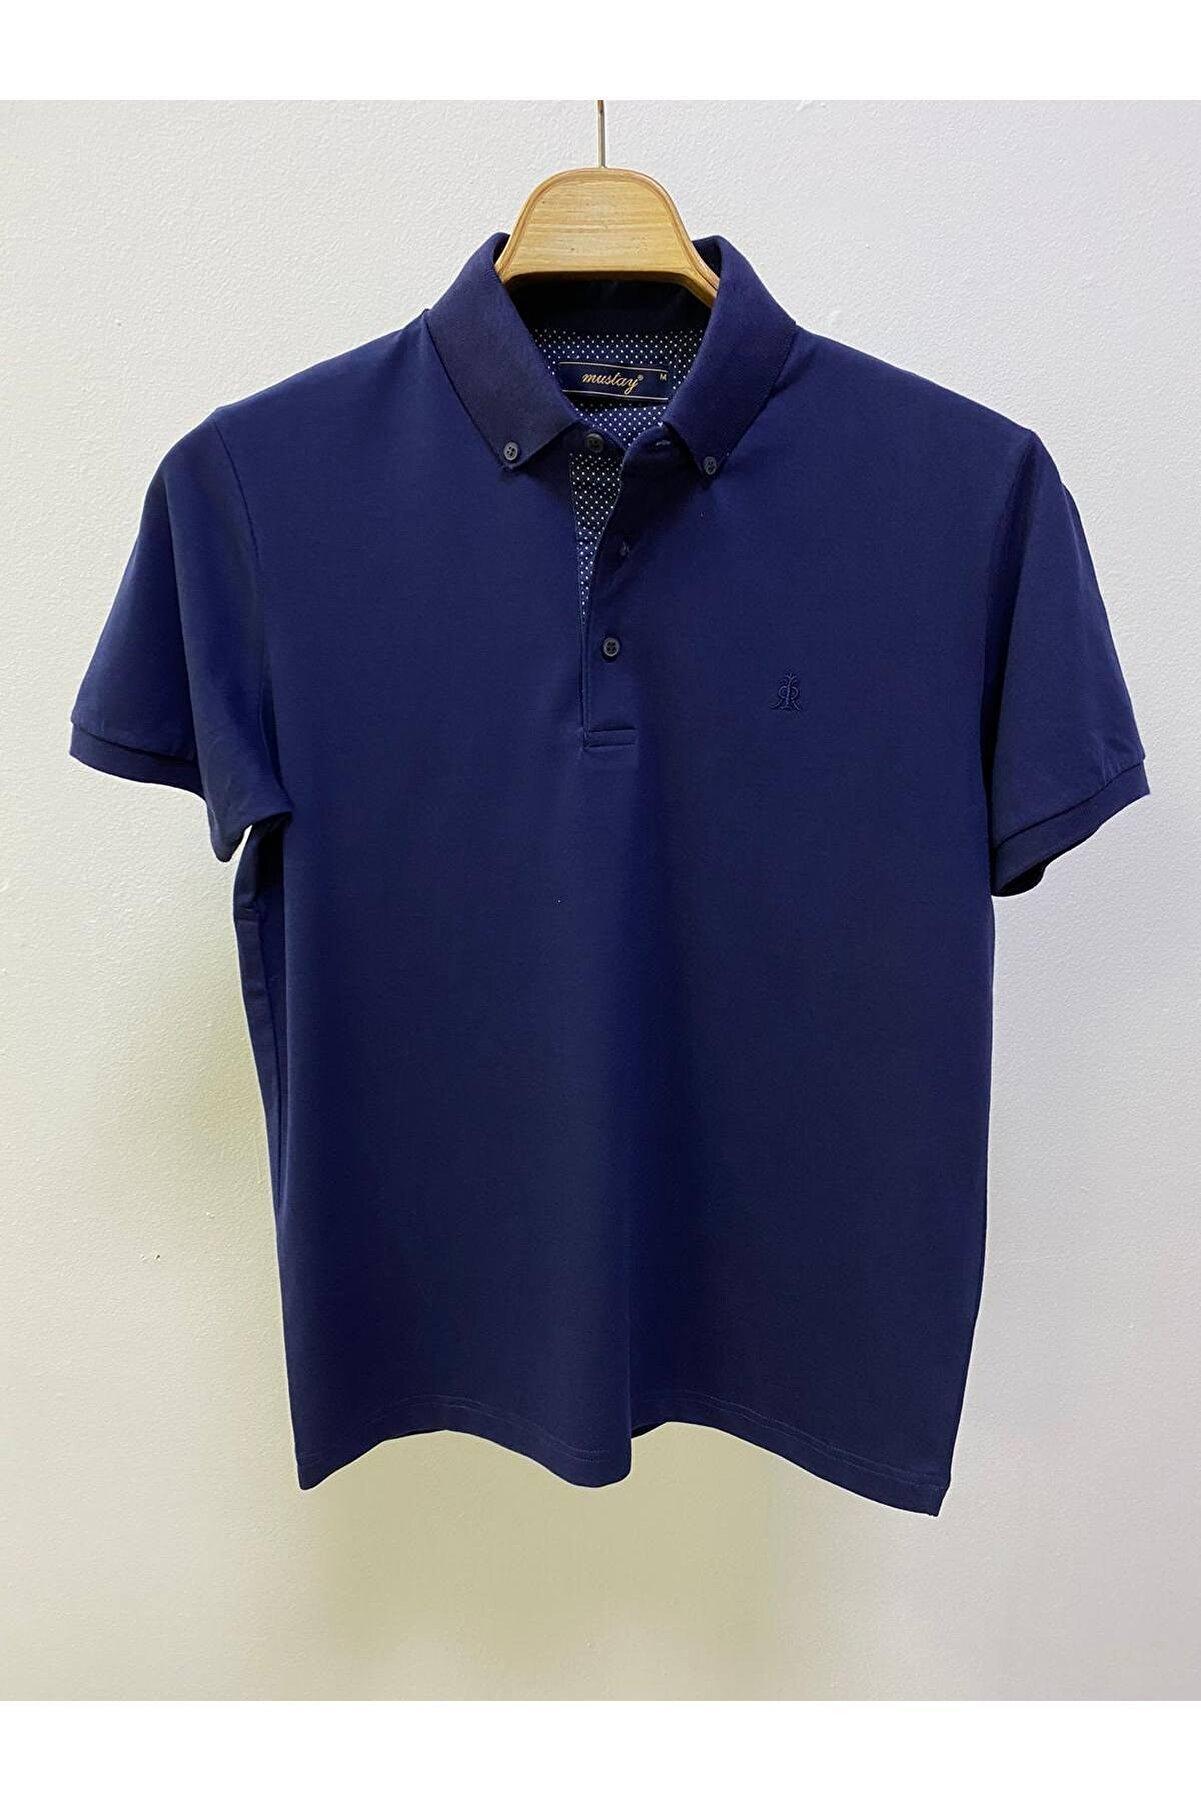 MUSTAY Yakalı Pamuklu Erkek Tişört. %97 Pamuk %3 Likra -düğmeli Yaka Pamuklu Erkek Tshırt